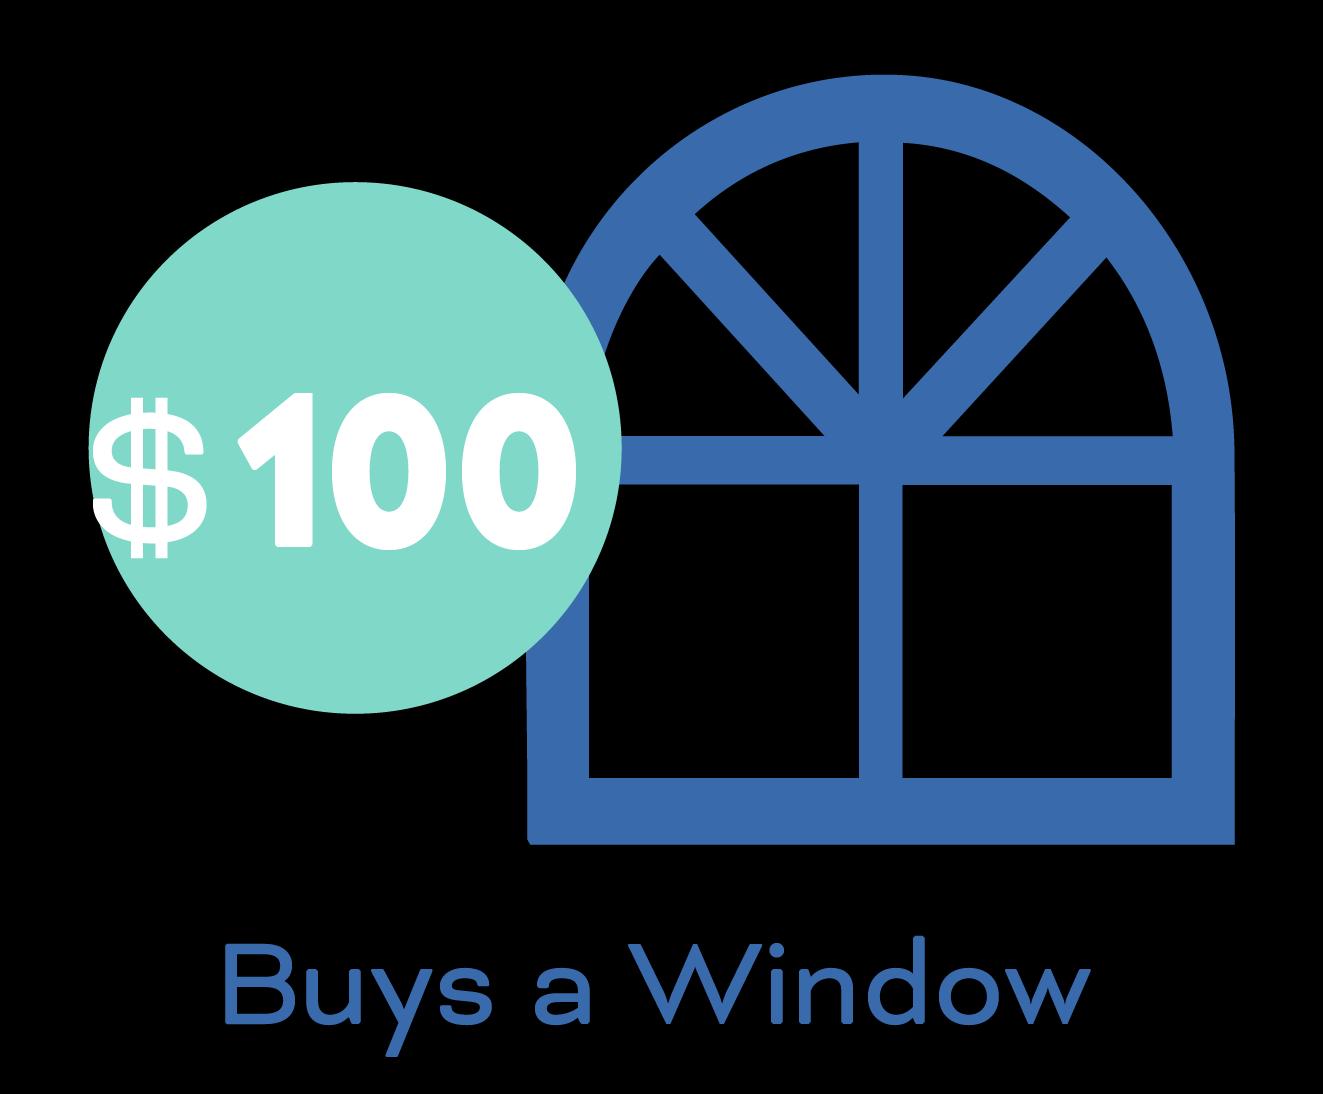 $100 buys a window.